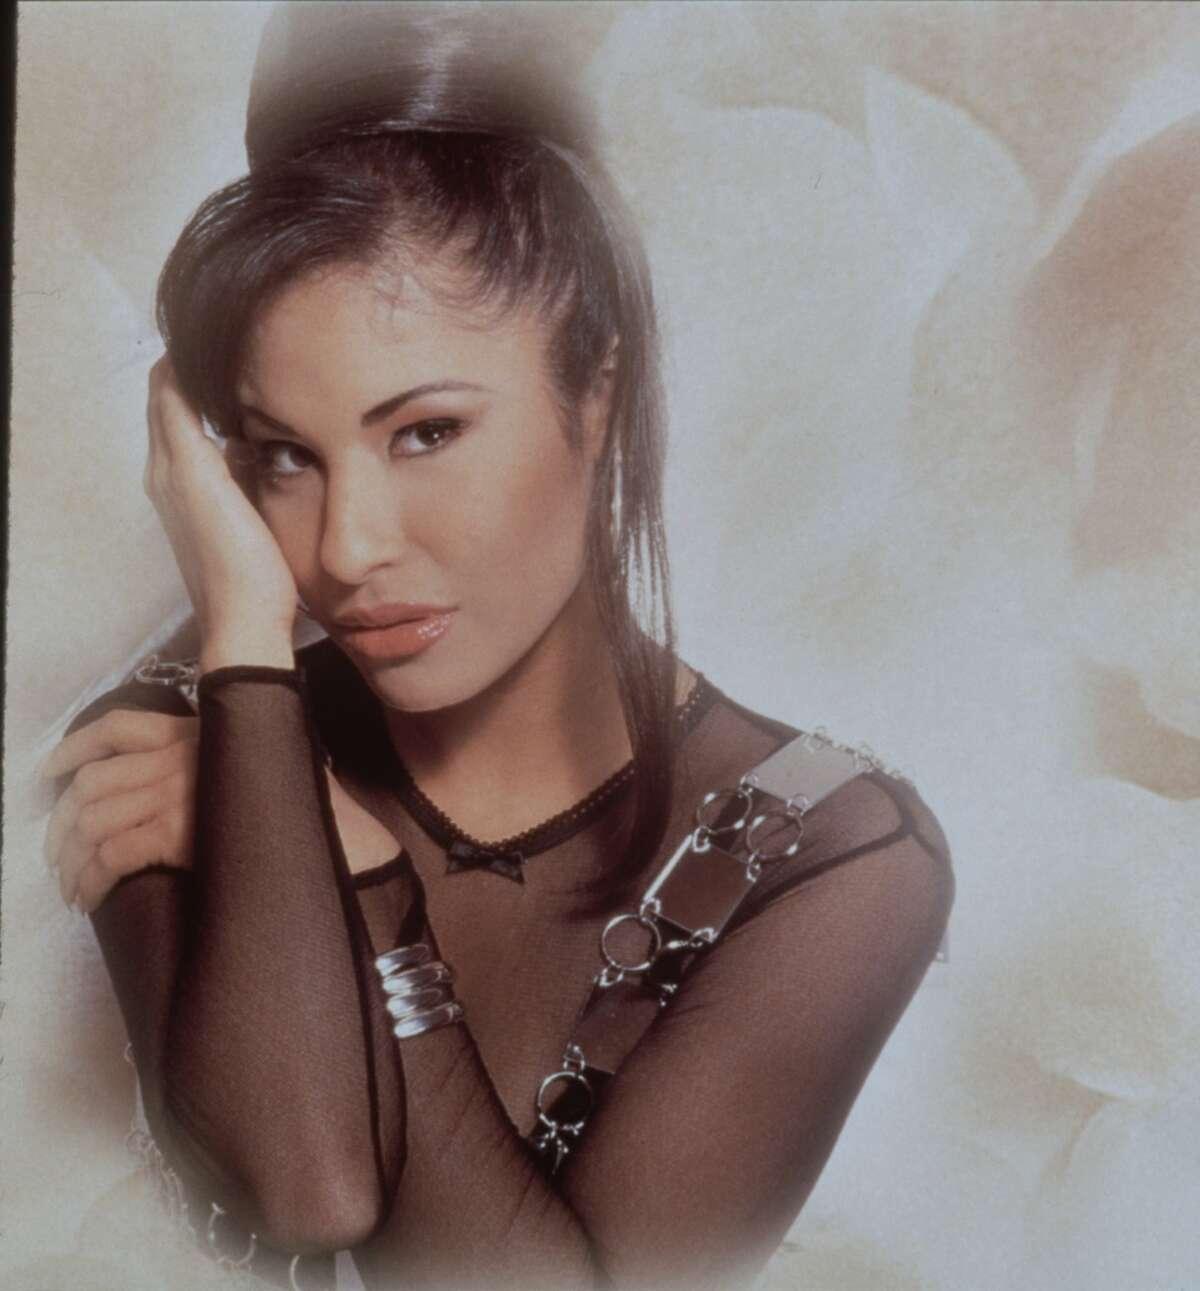 Selena Forever: Iconic photos of the Tejano star Selena Quintanilla Pérez.